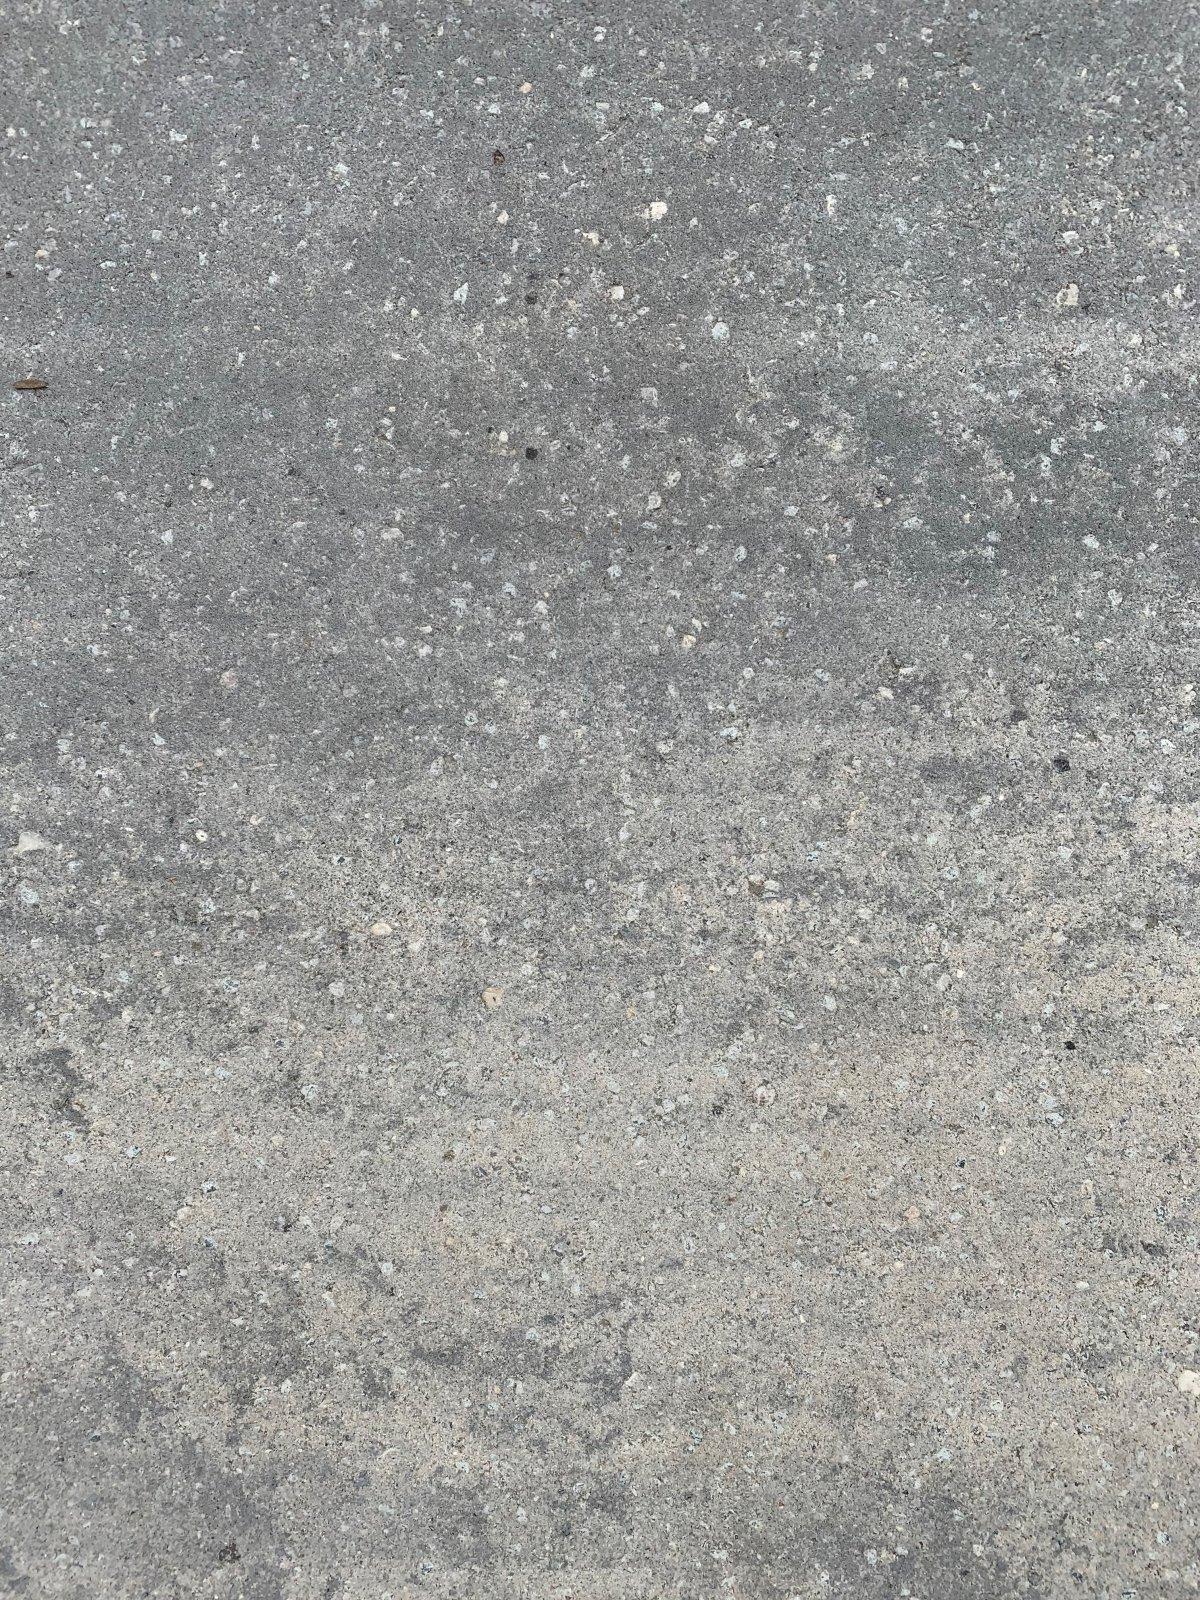 Paver - Keystone City Stone Supra